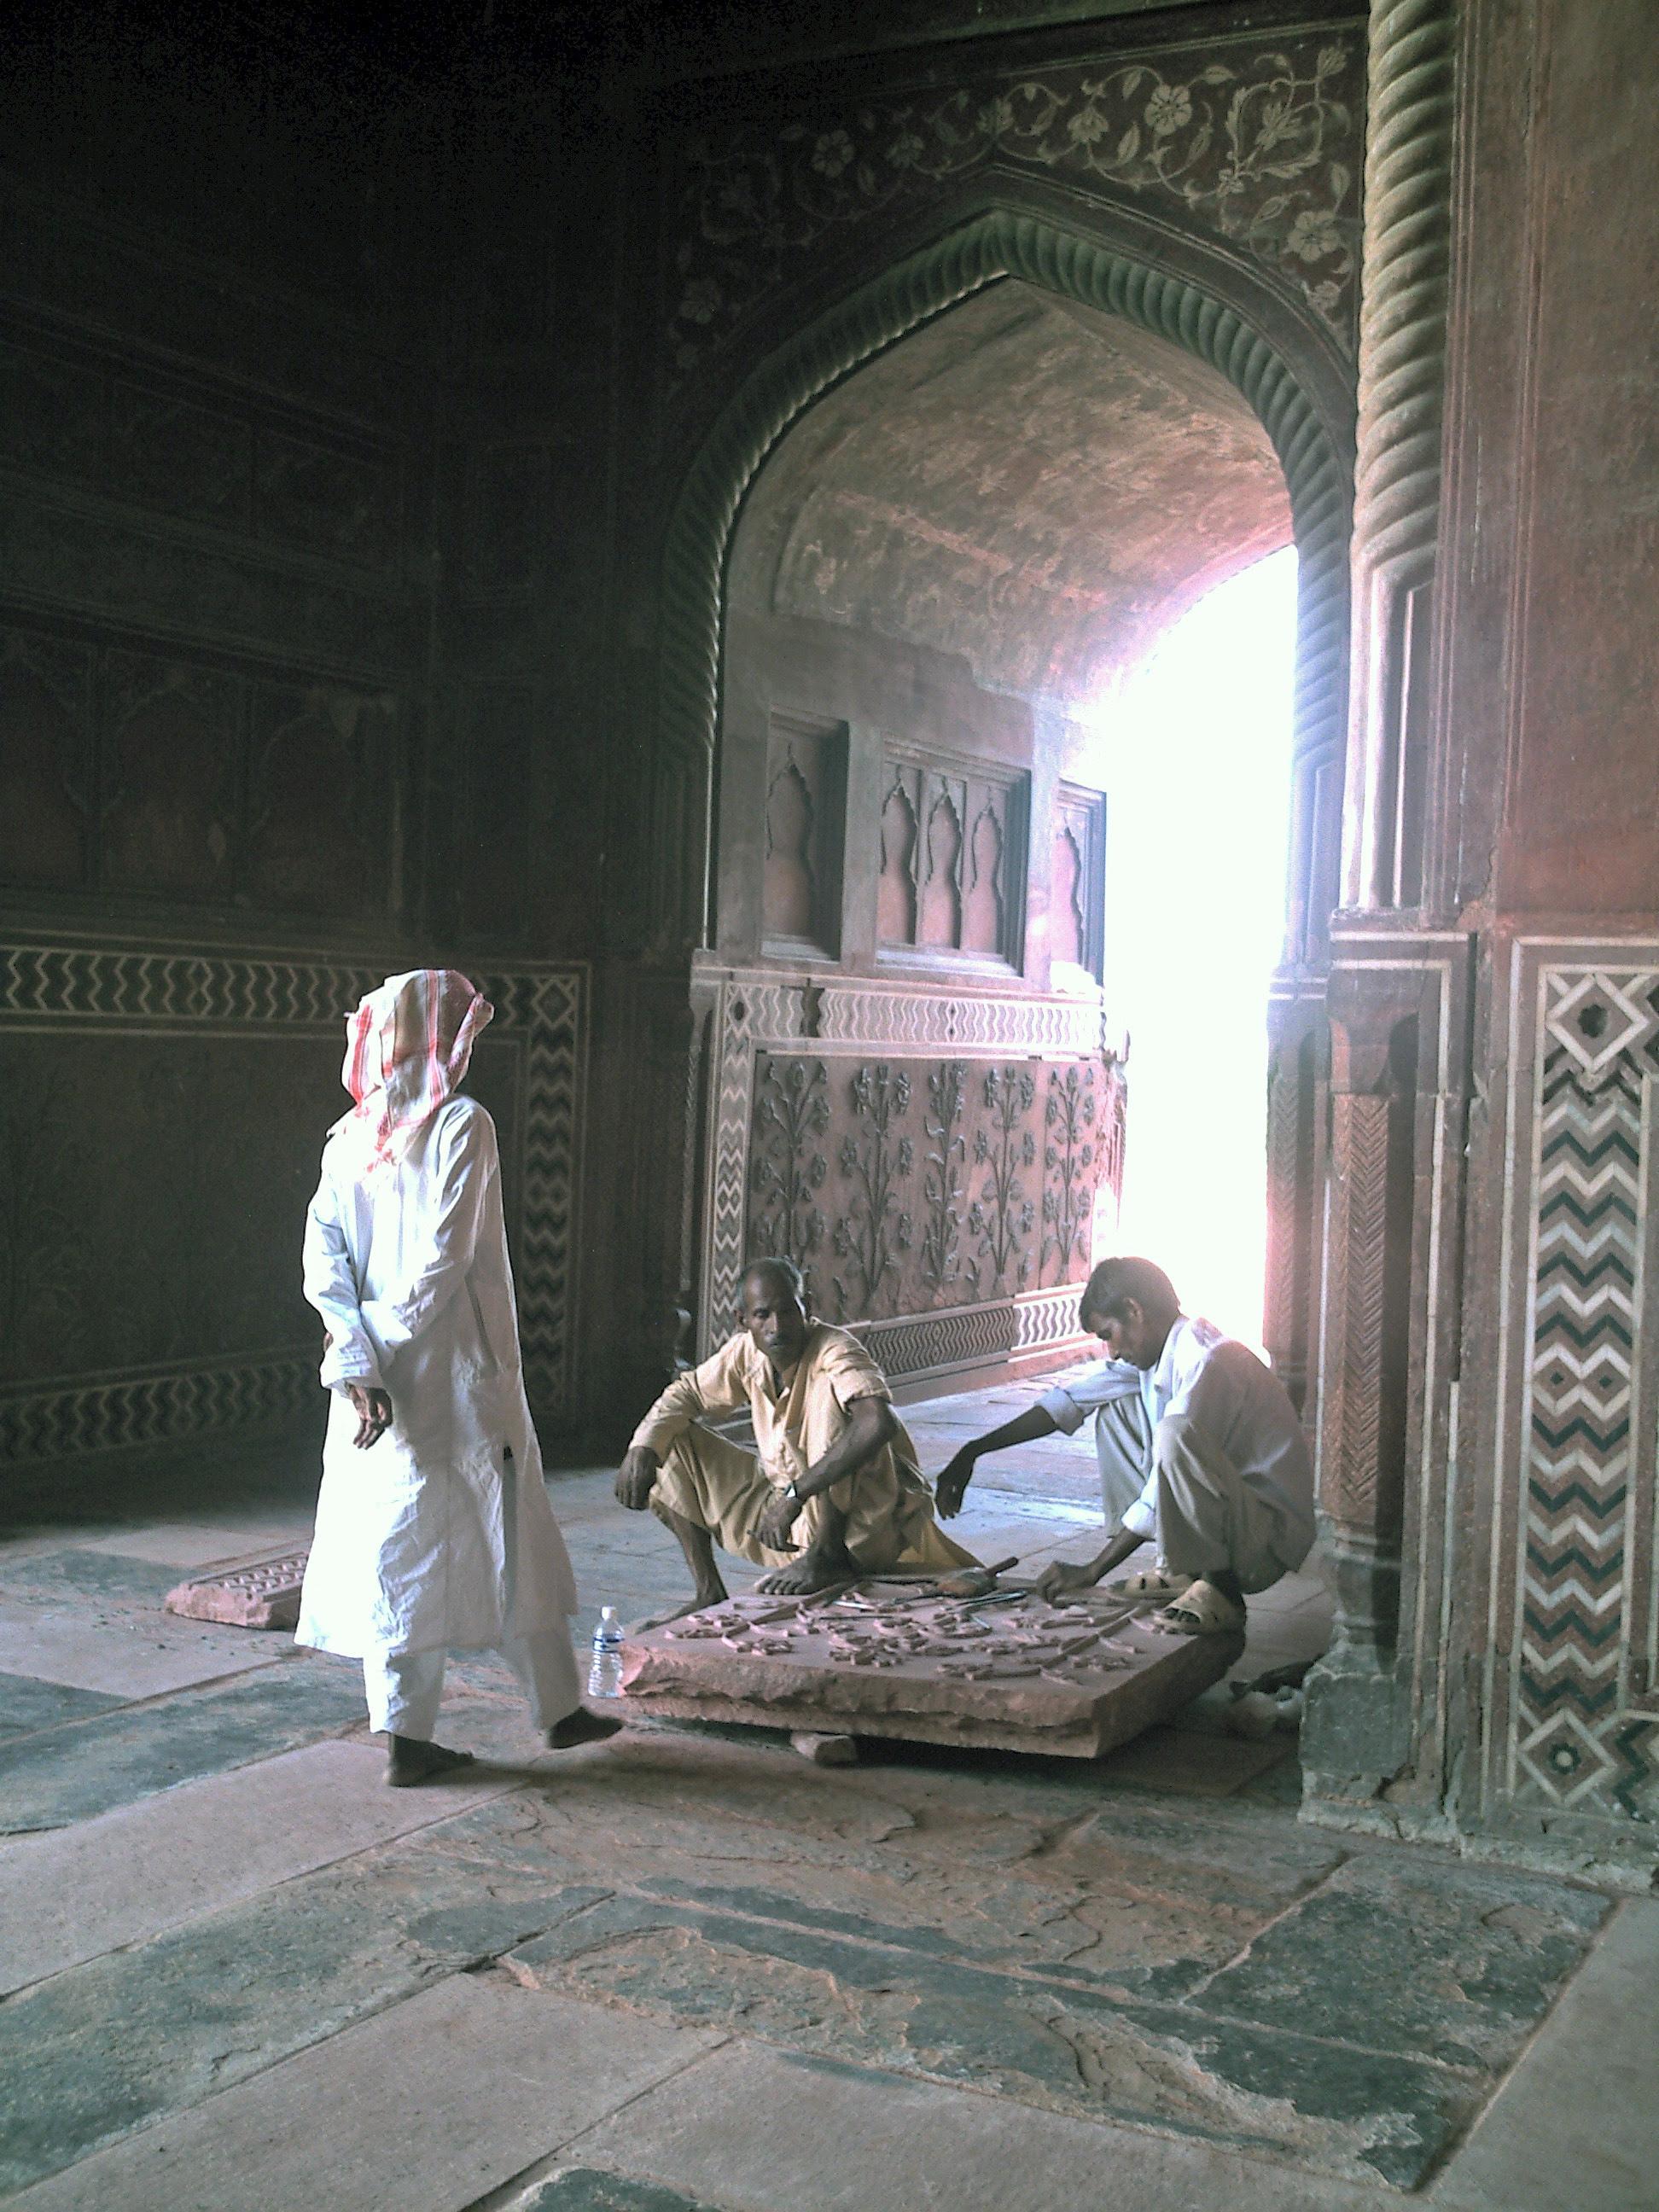 artisans working in India